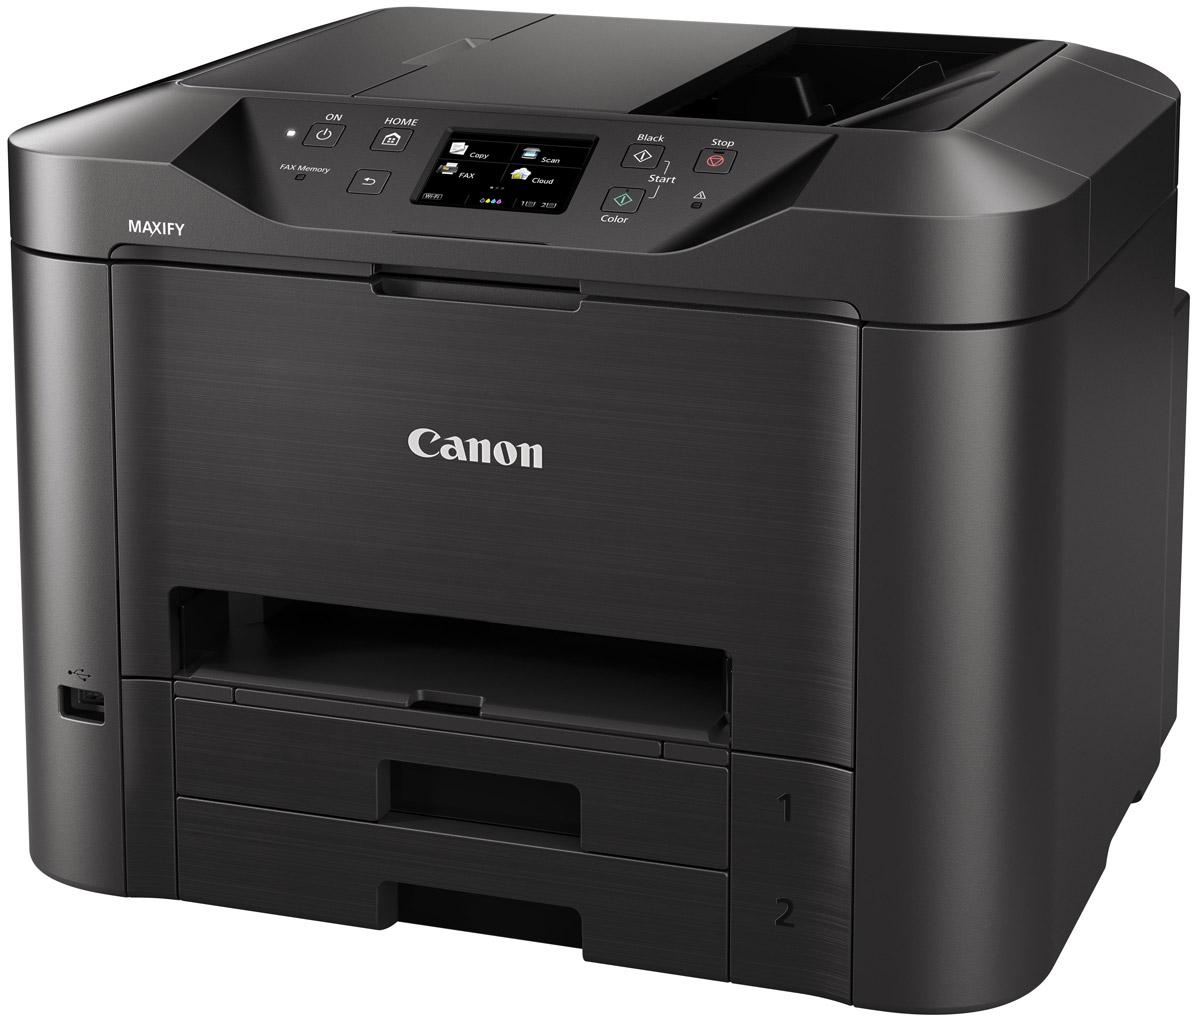 Canon MAXIFY MB5340 МФУ